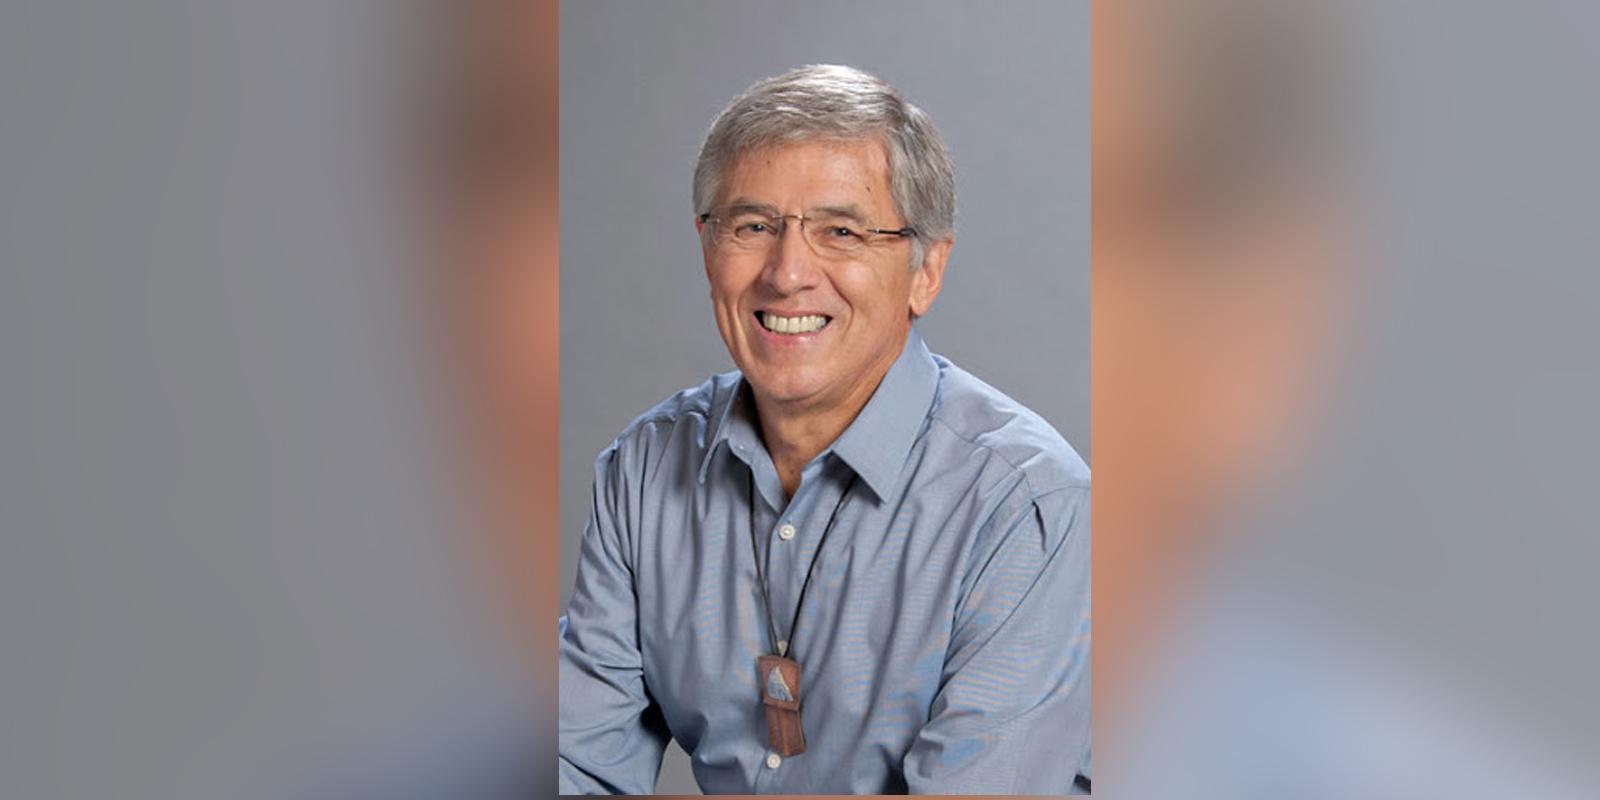 Speaker Edgmon sends condolences to Mallott family, remembers former lieutenant governor